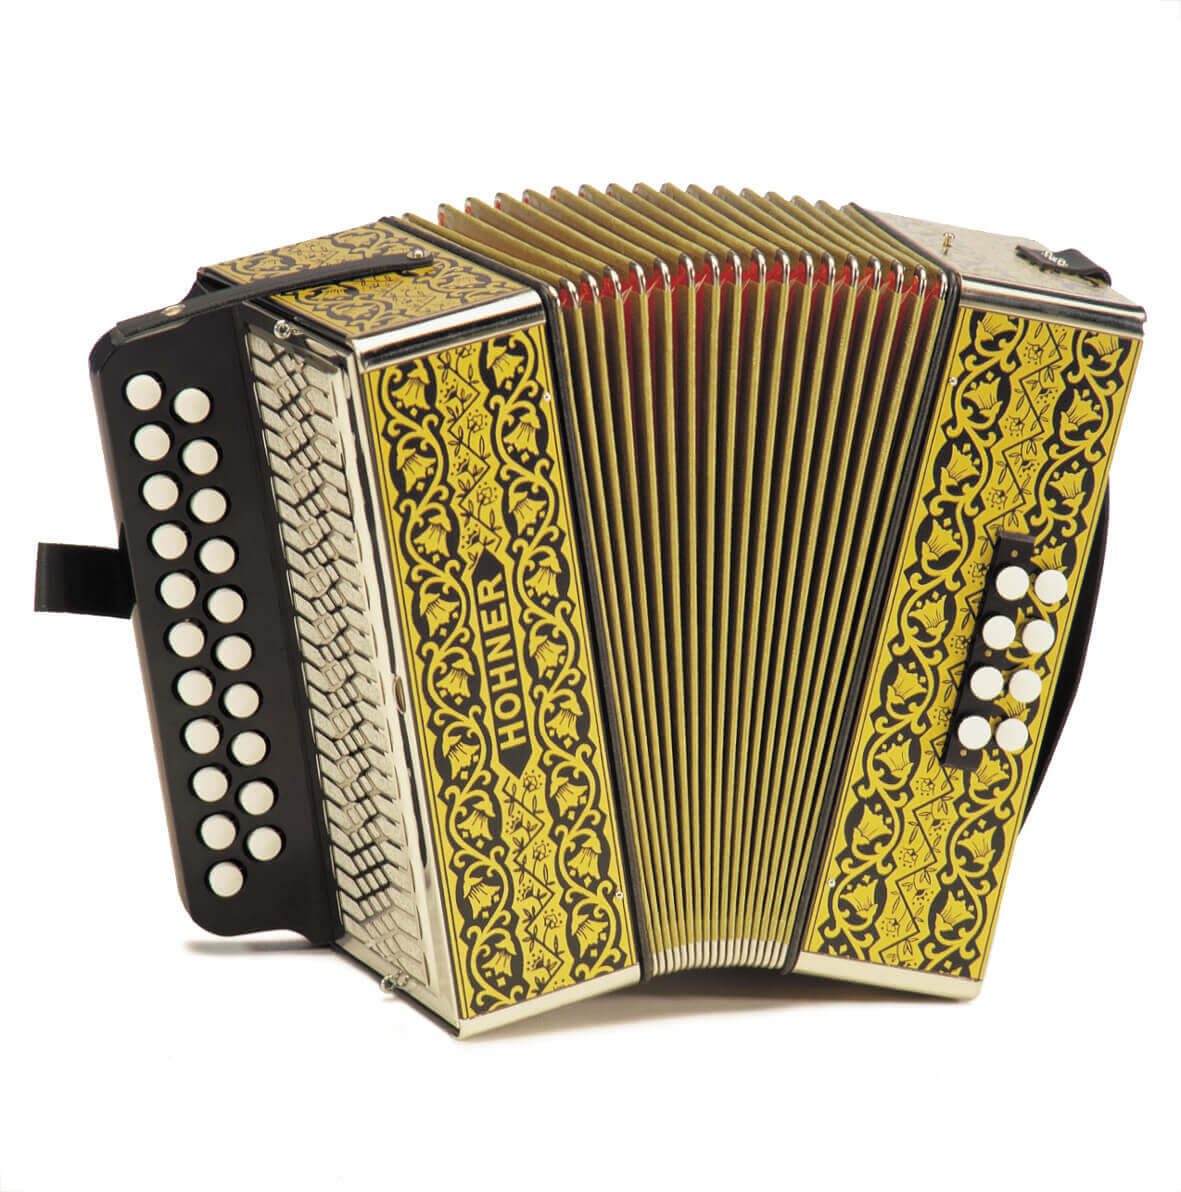 Accordéons - ACCORDEONS - HOHNER - Accordéon diatonique 2915 AD - Royez Musik